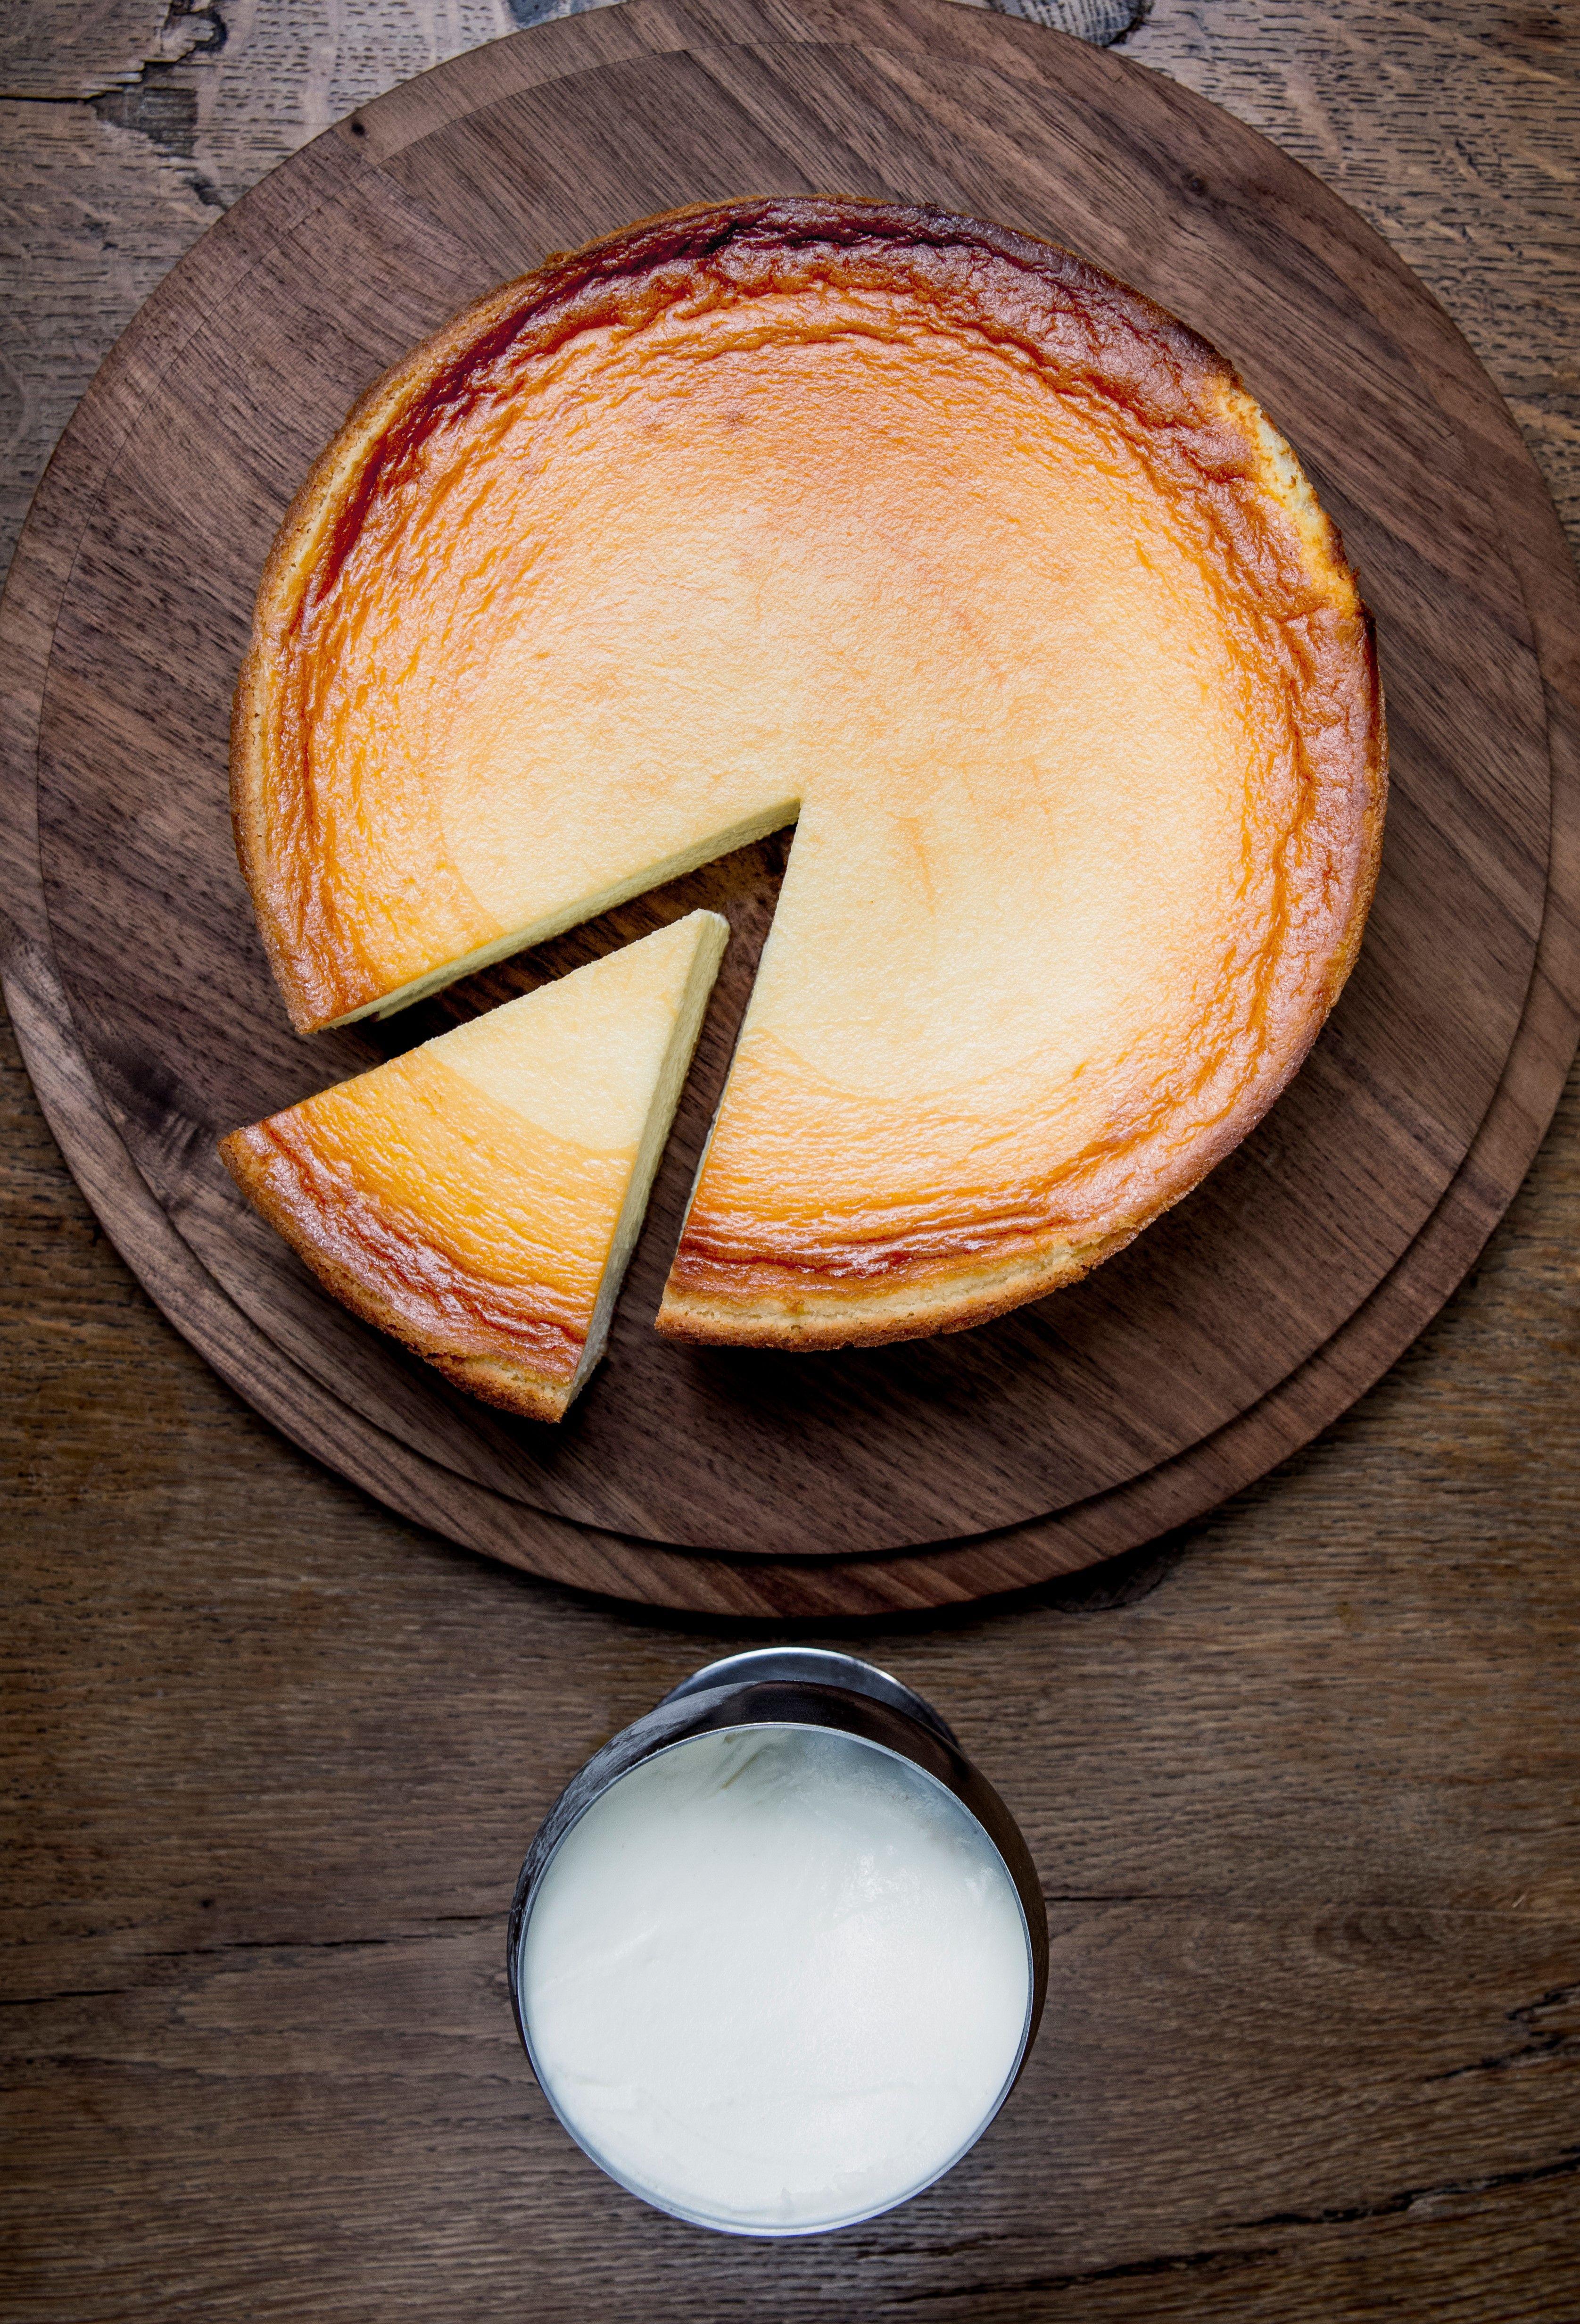 Notre Gateau Prefere Au Fromage Blanc Spoon Dessert Desserts Fromage Blanc